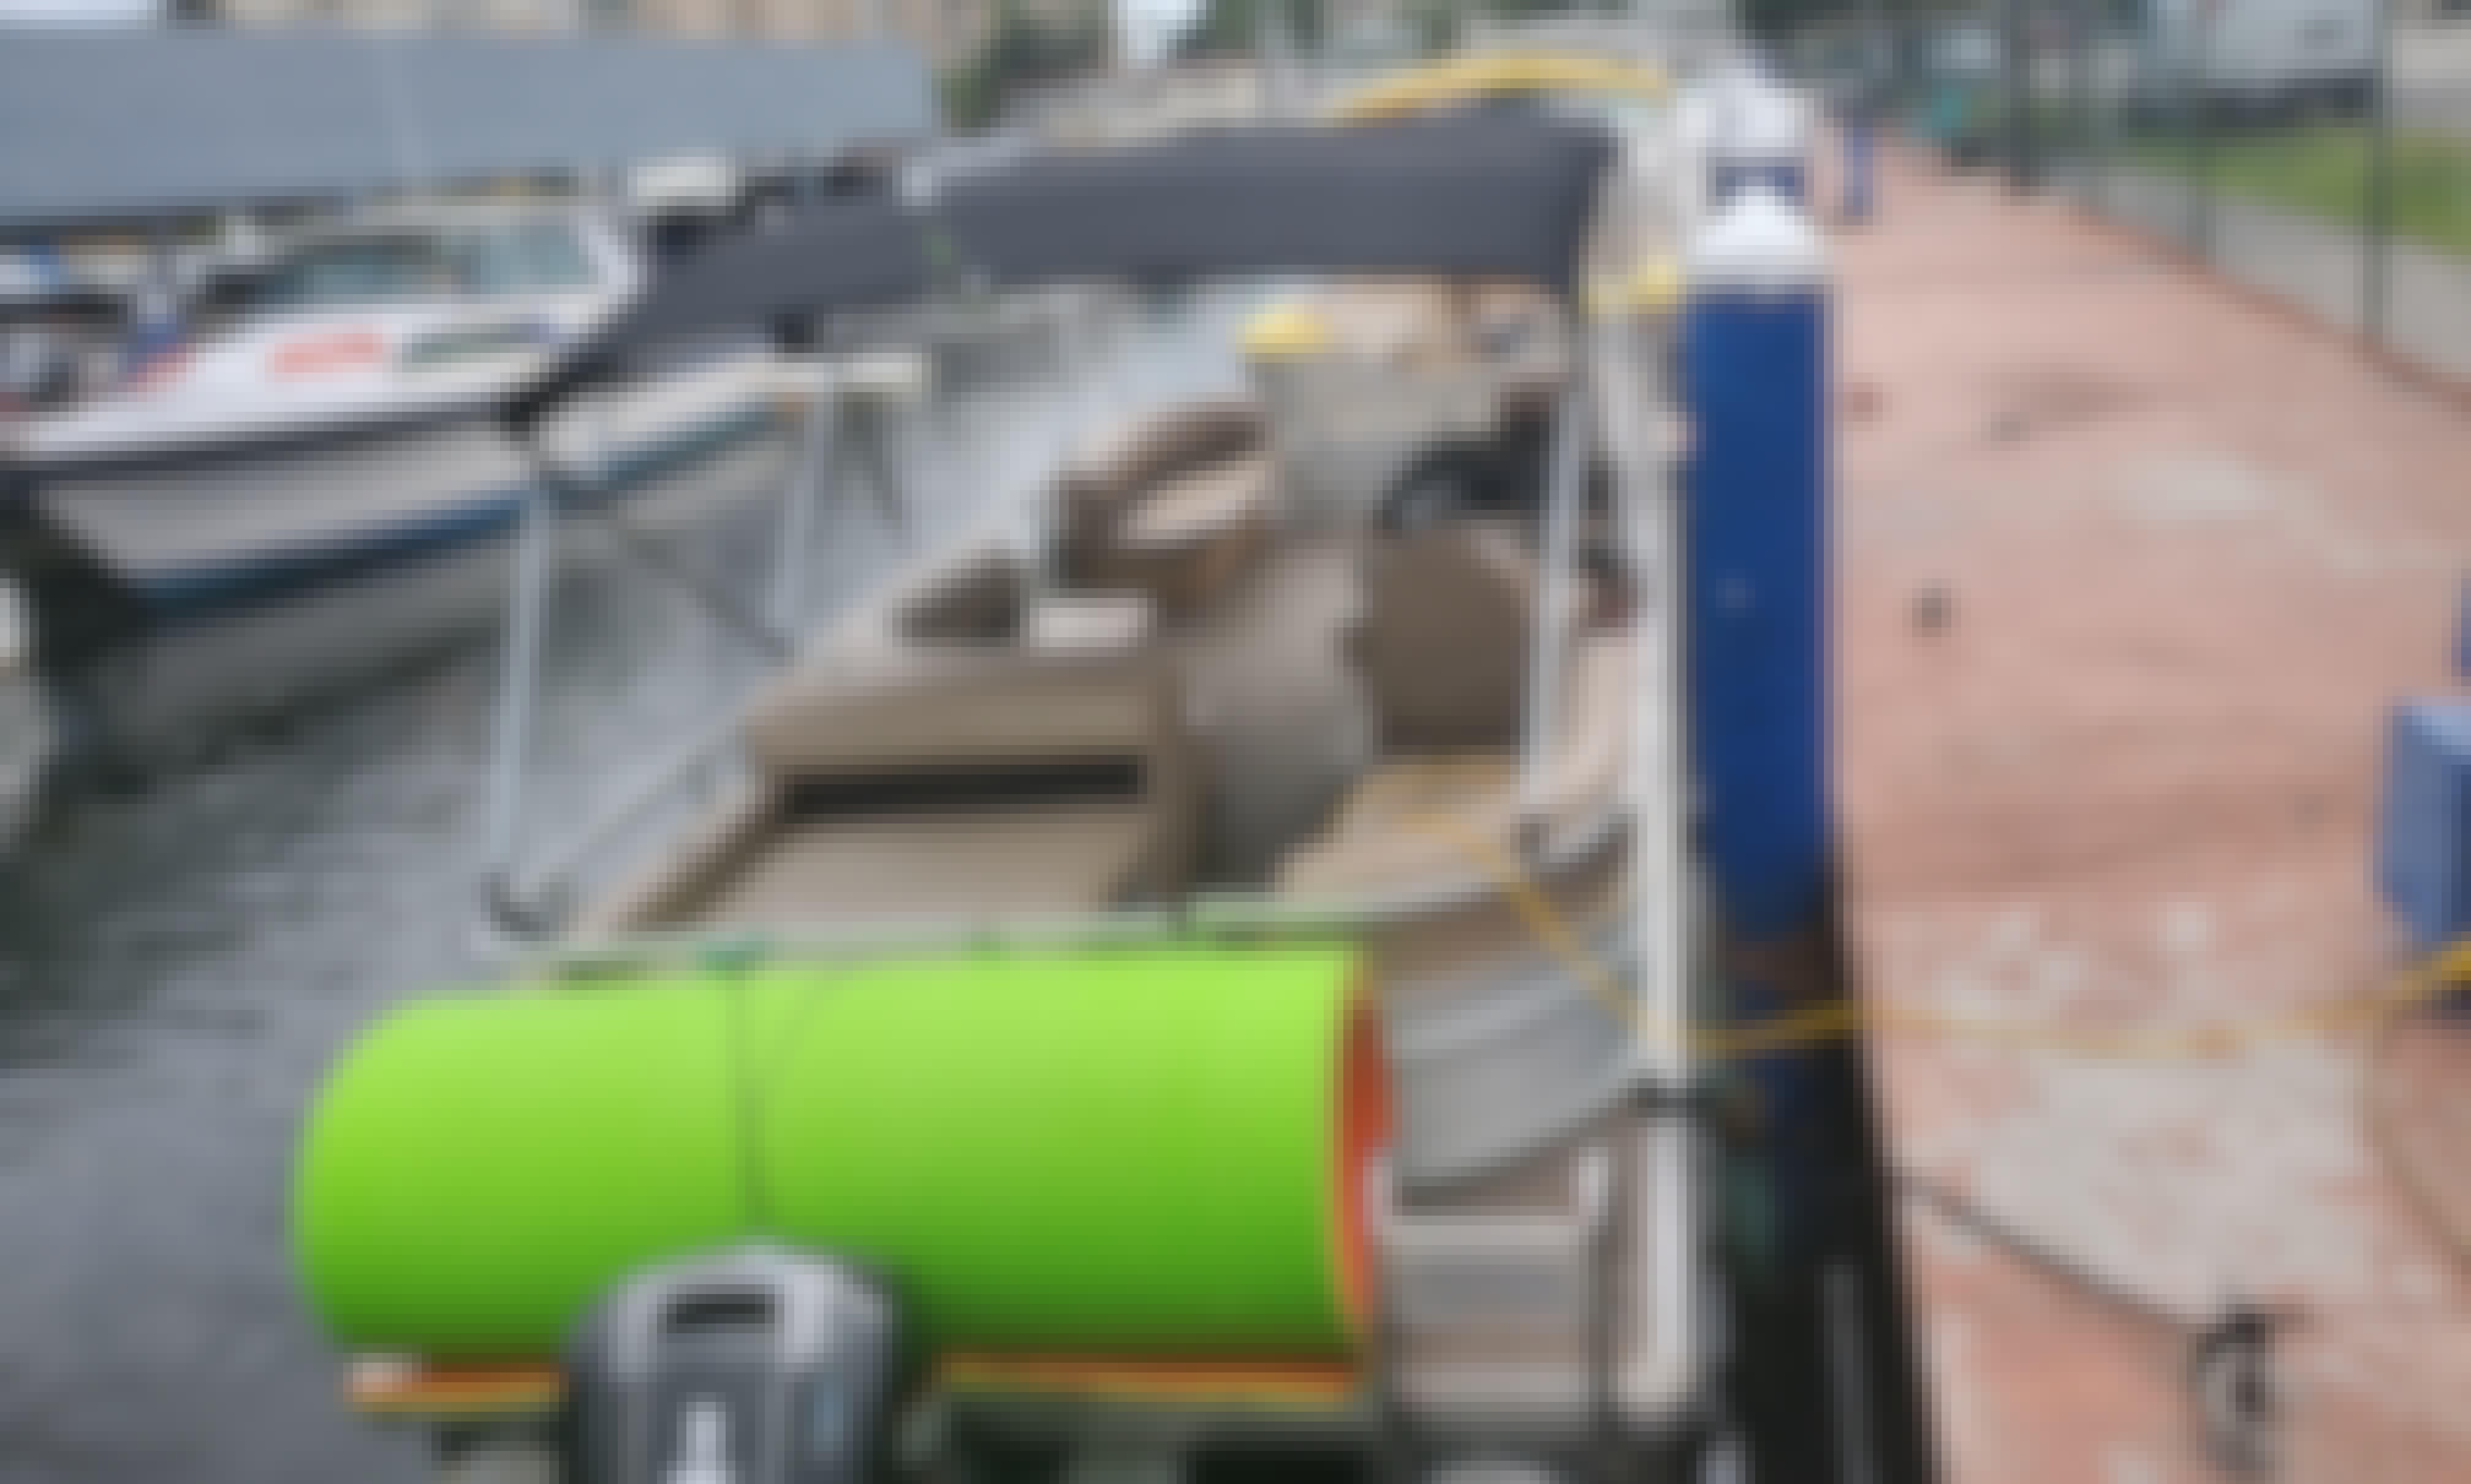 2018 Sea Water Pontoon Boat Rental in Sunny Isles Beach, Florida